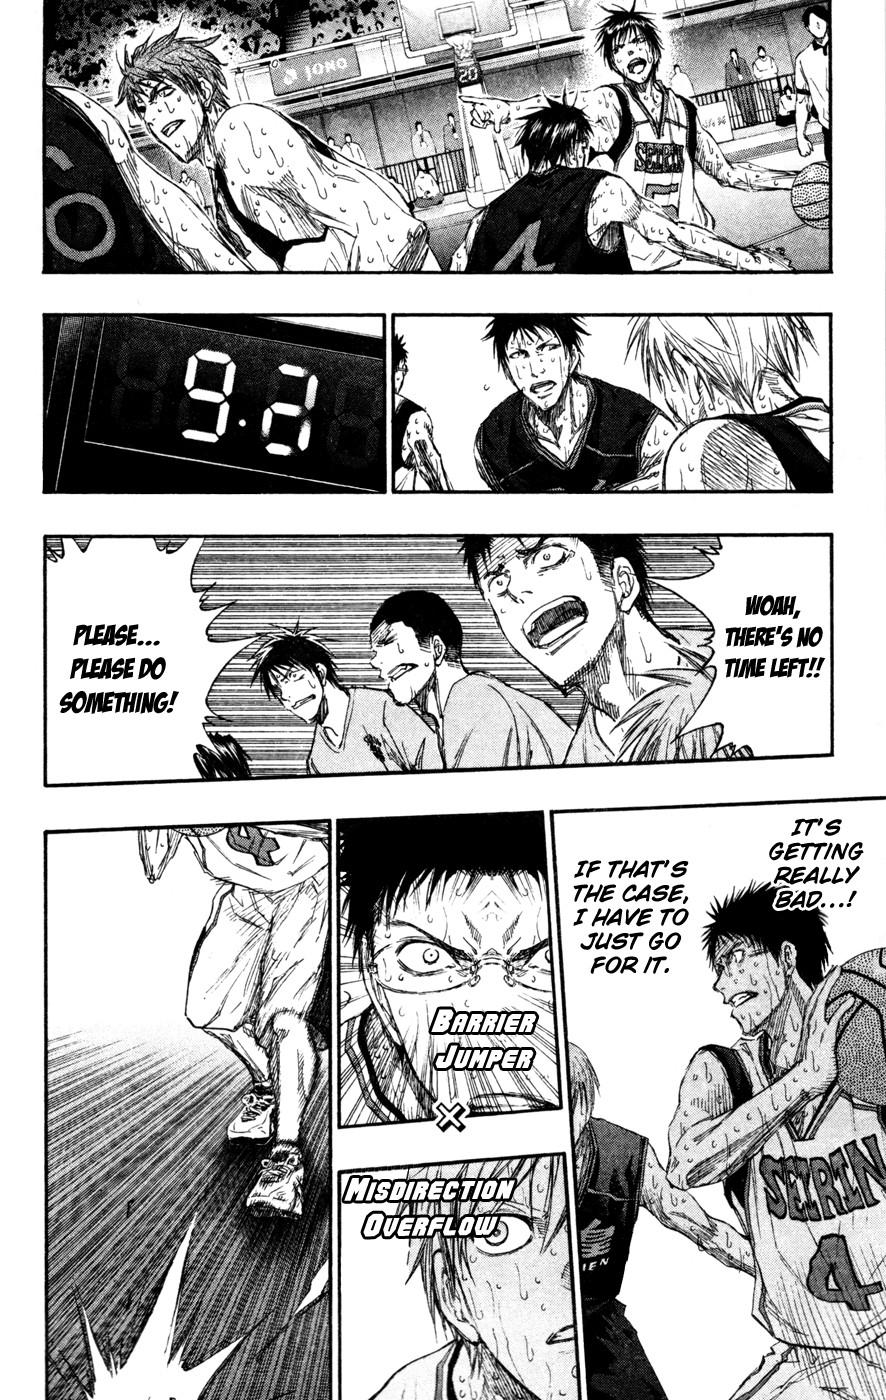 Kuroko no Basket Manga Chapter 137 - Image 12